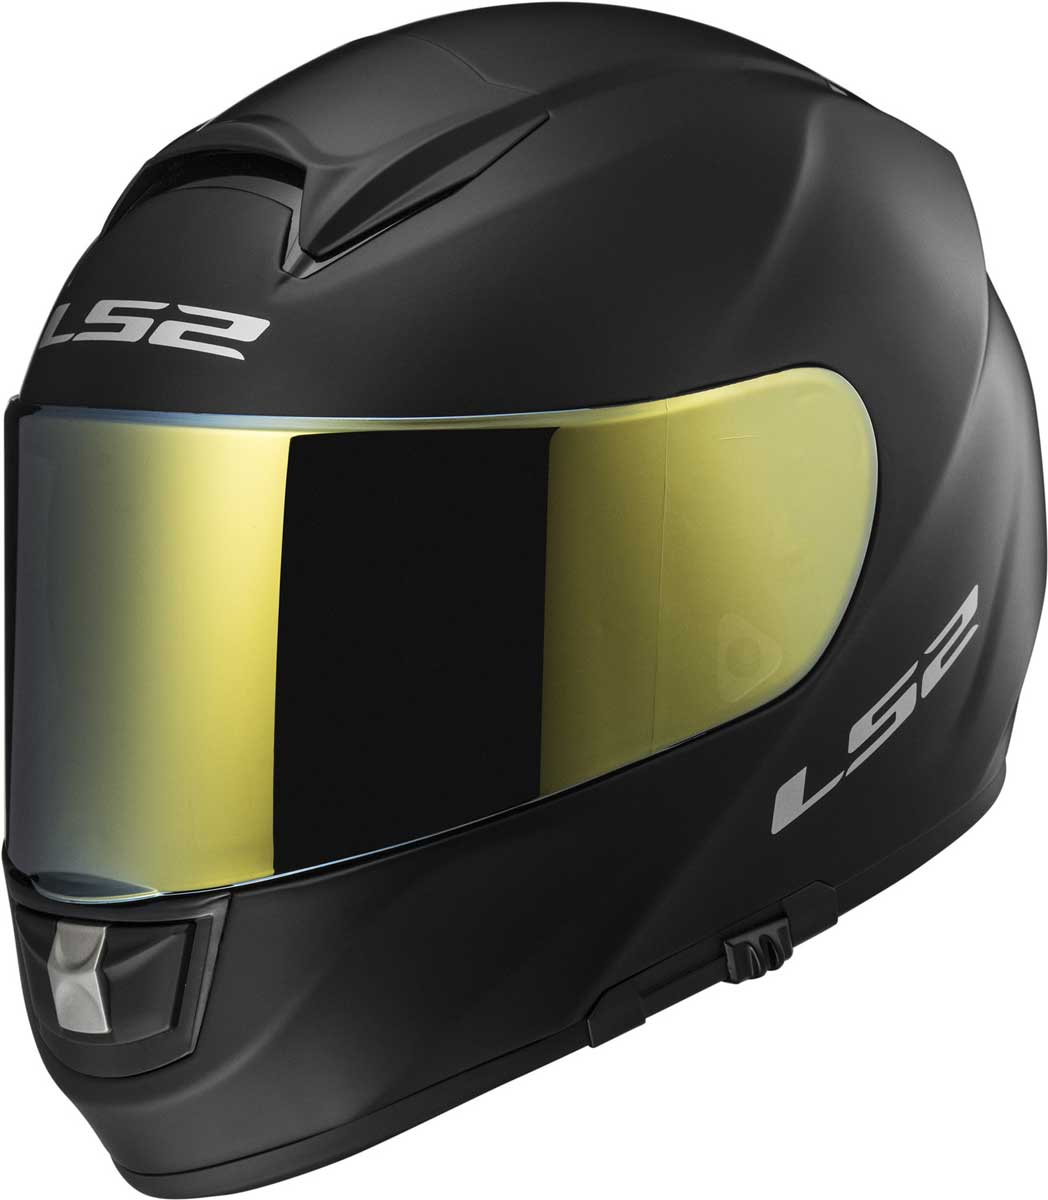 ls2 visier iridium gold f r den ff397 vector cs bikewear. Black Bedroom Furniture Sets. Home Design Ideas